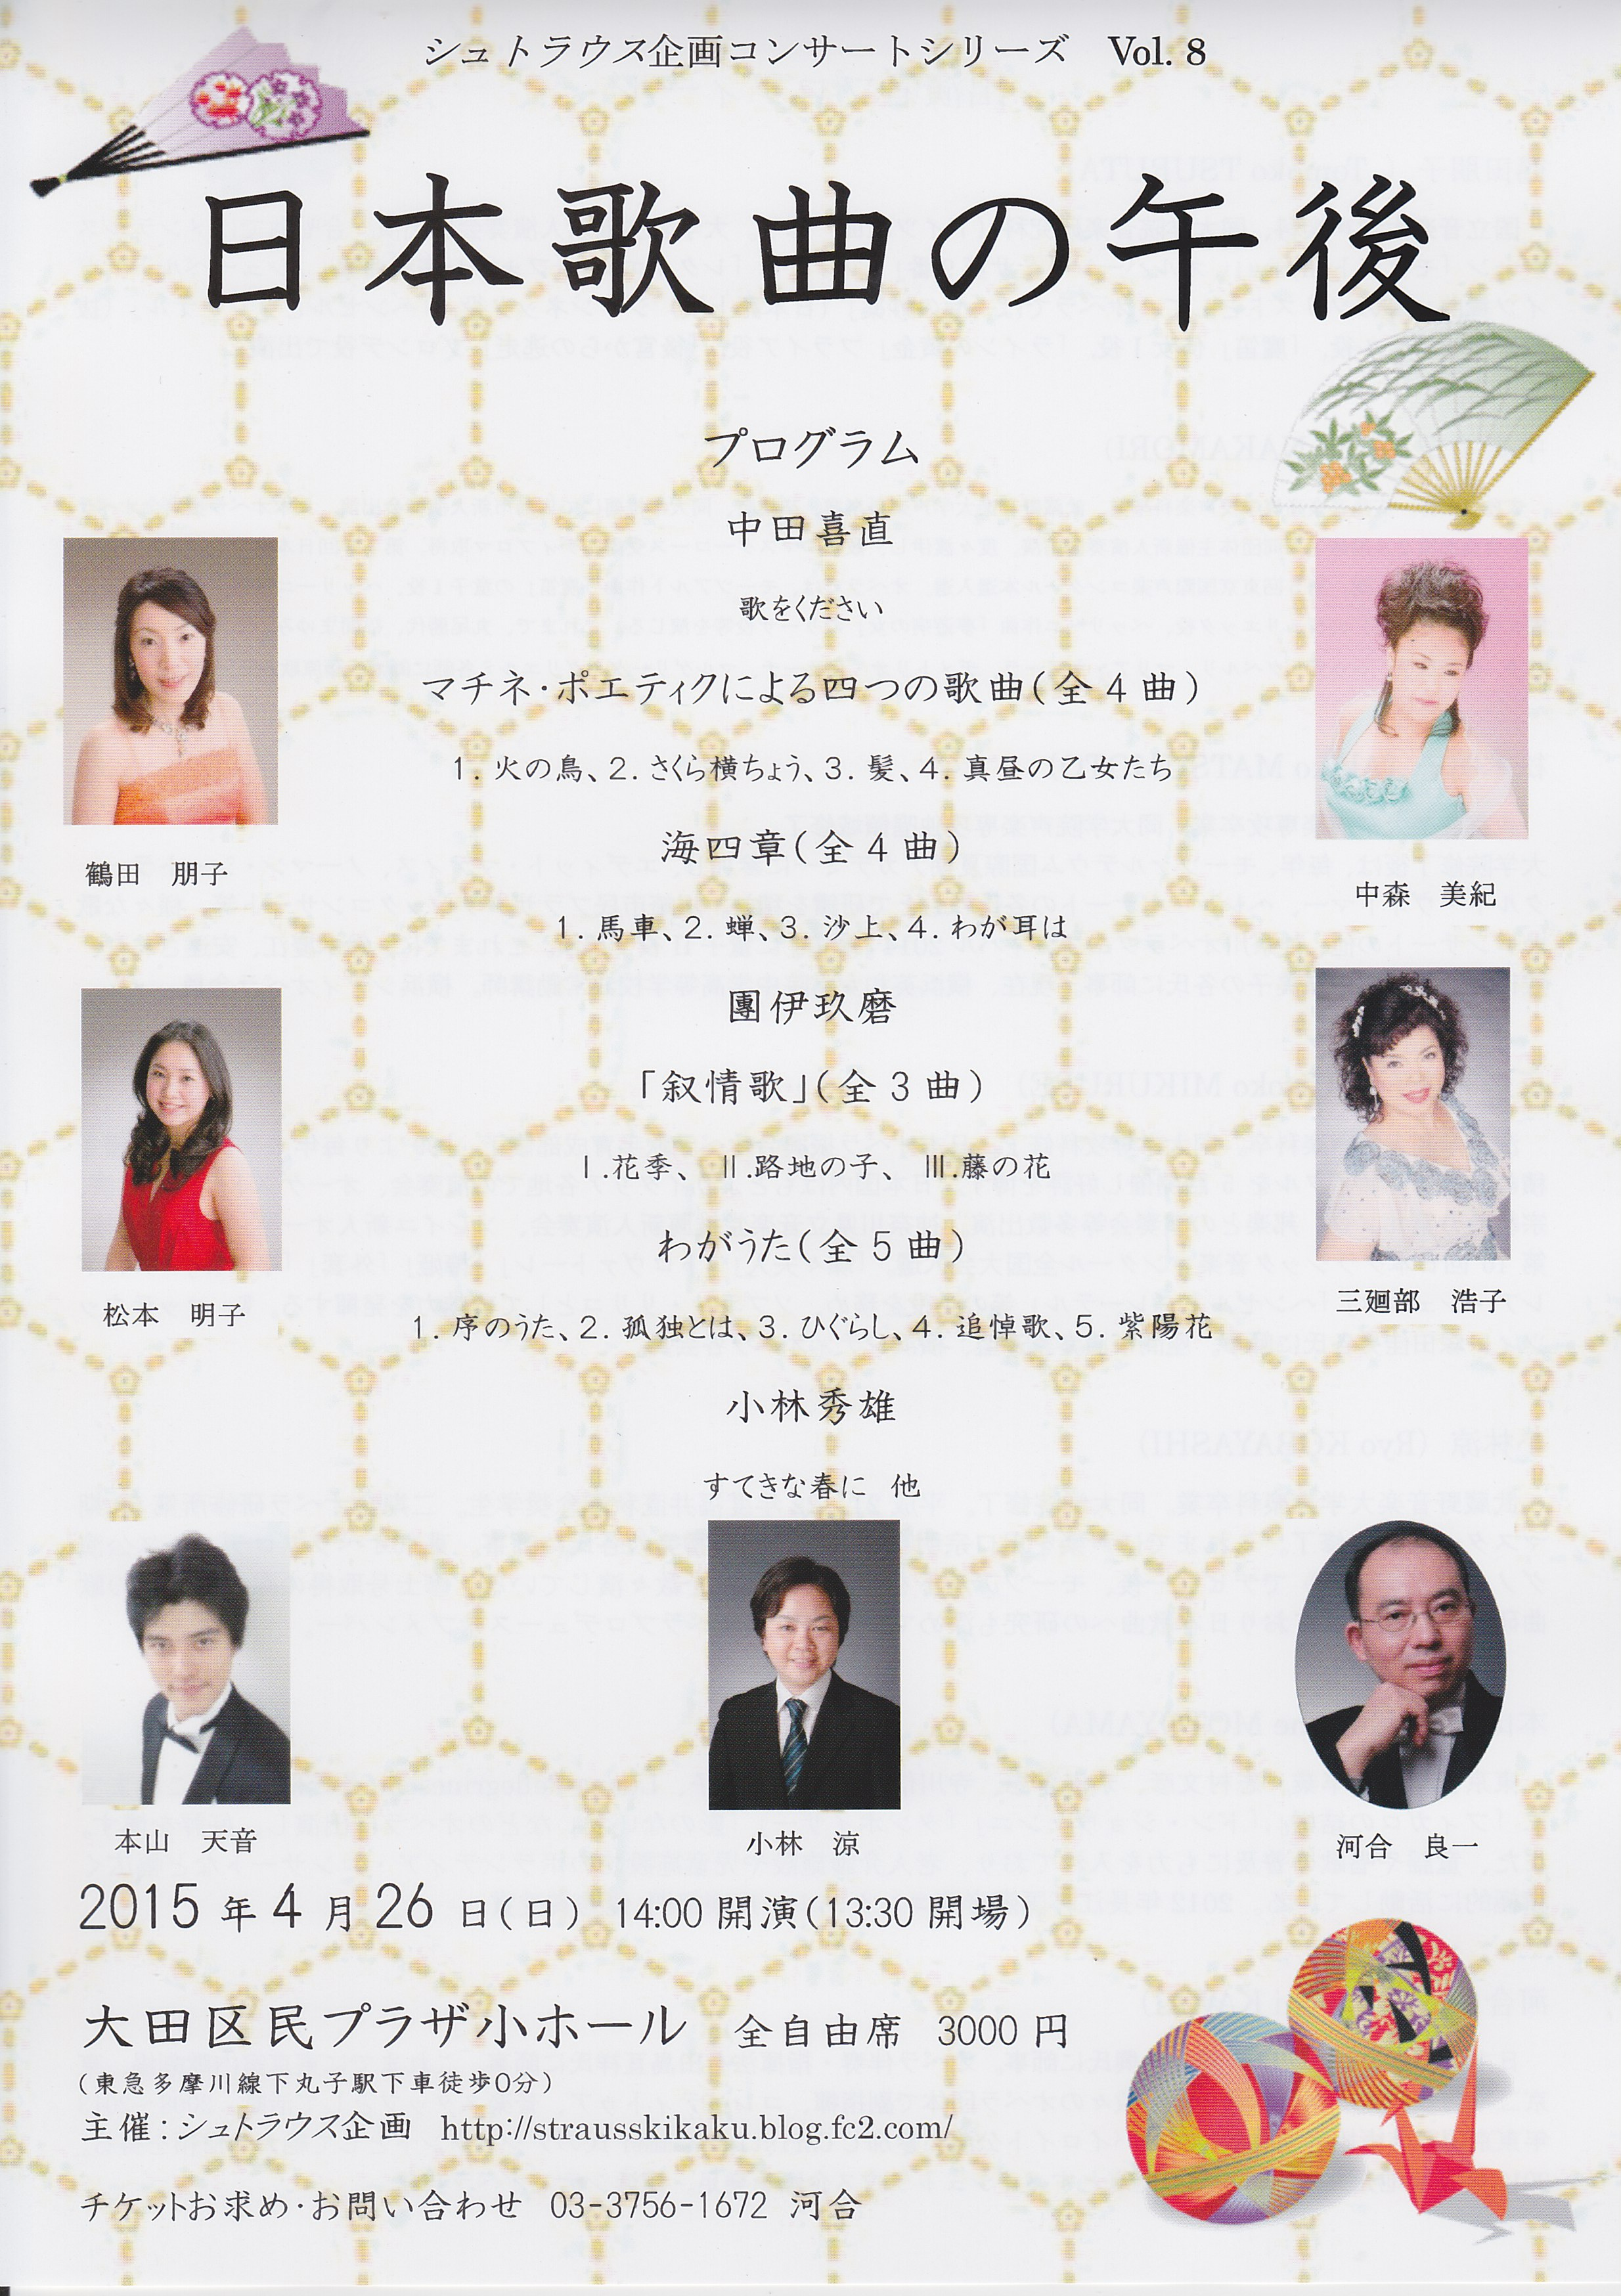 日本歌曲の午後 表 (2)